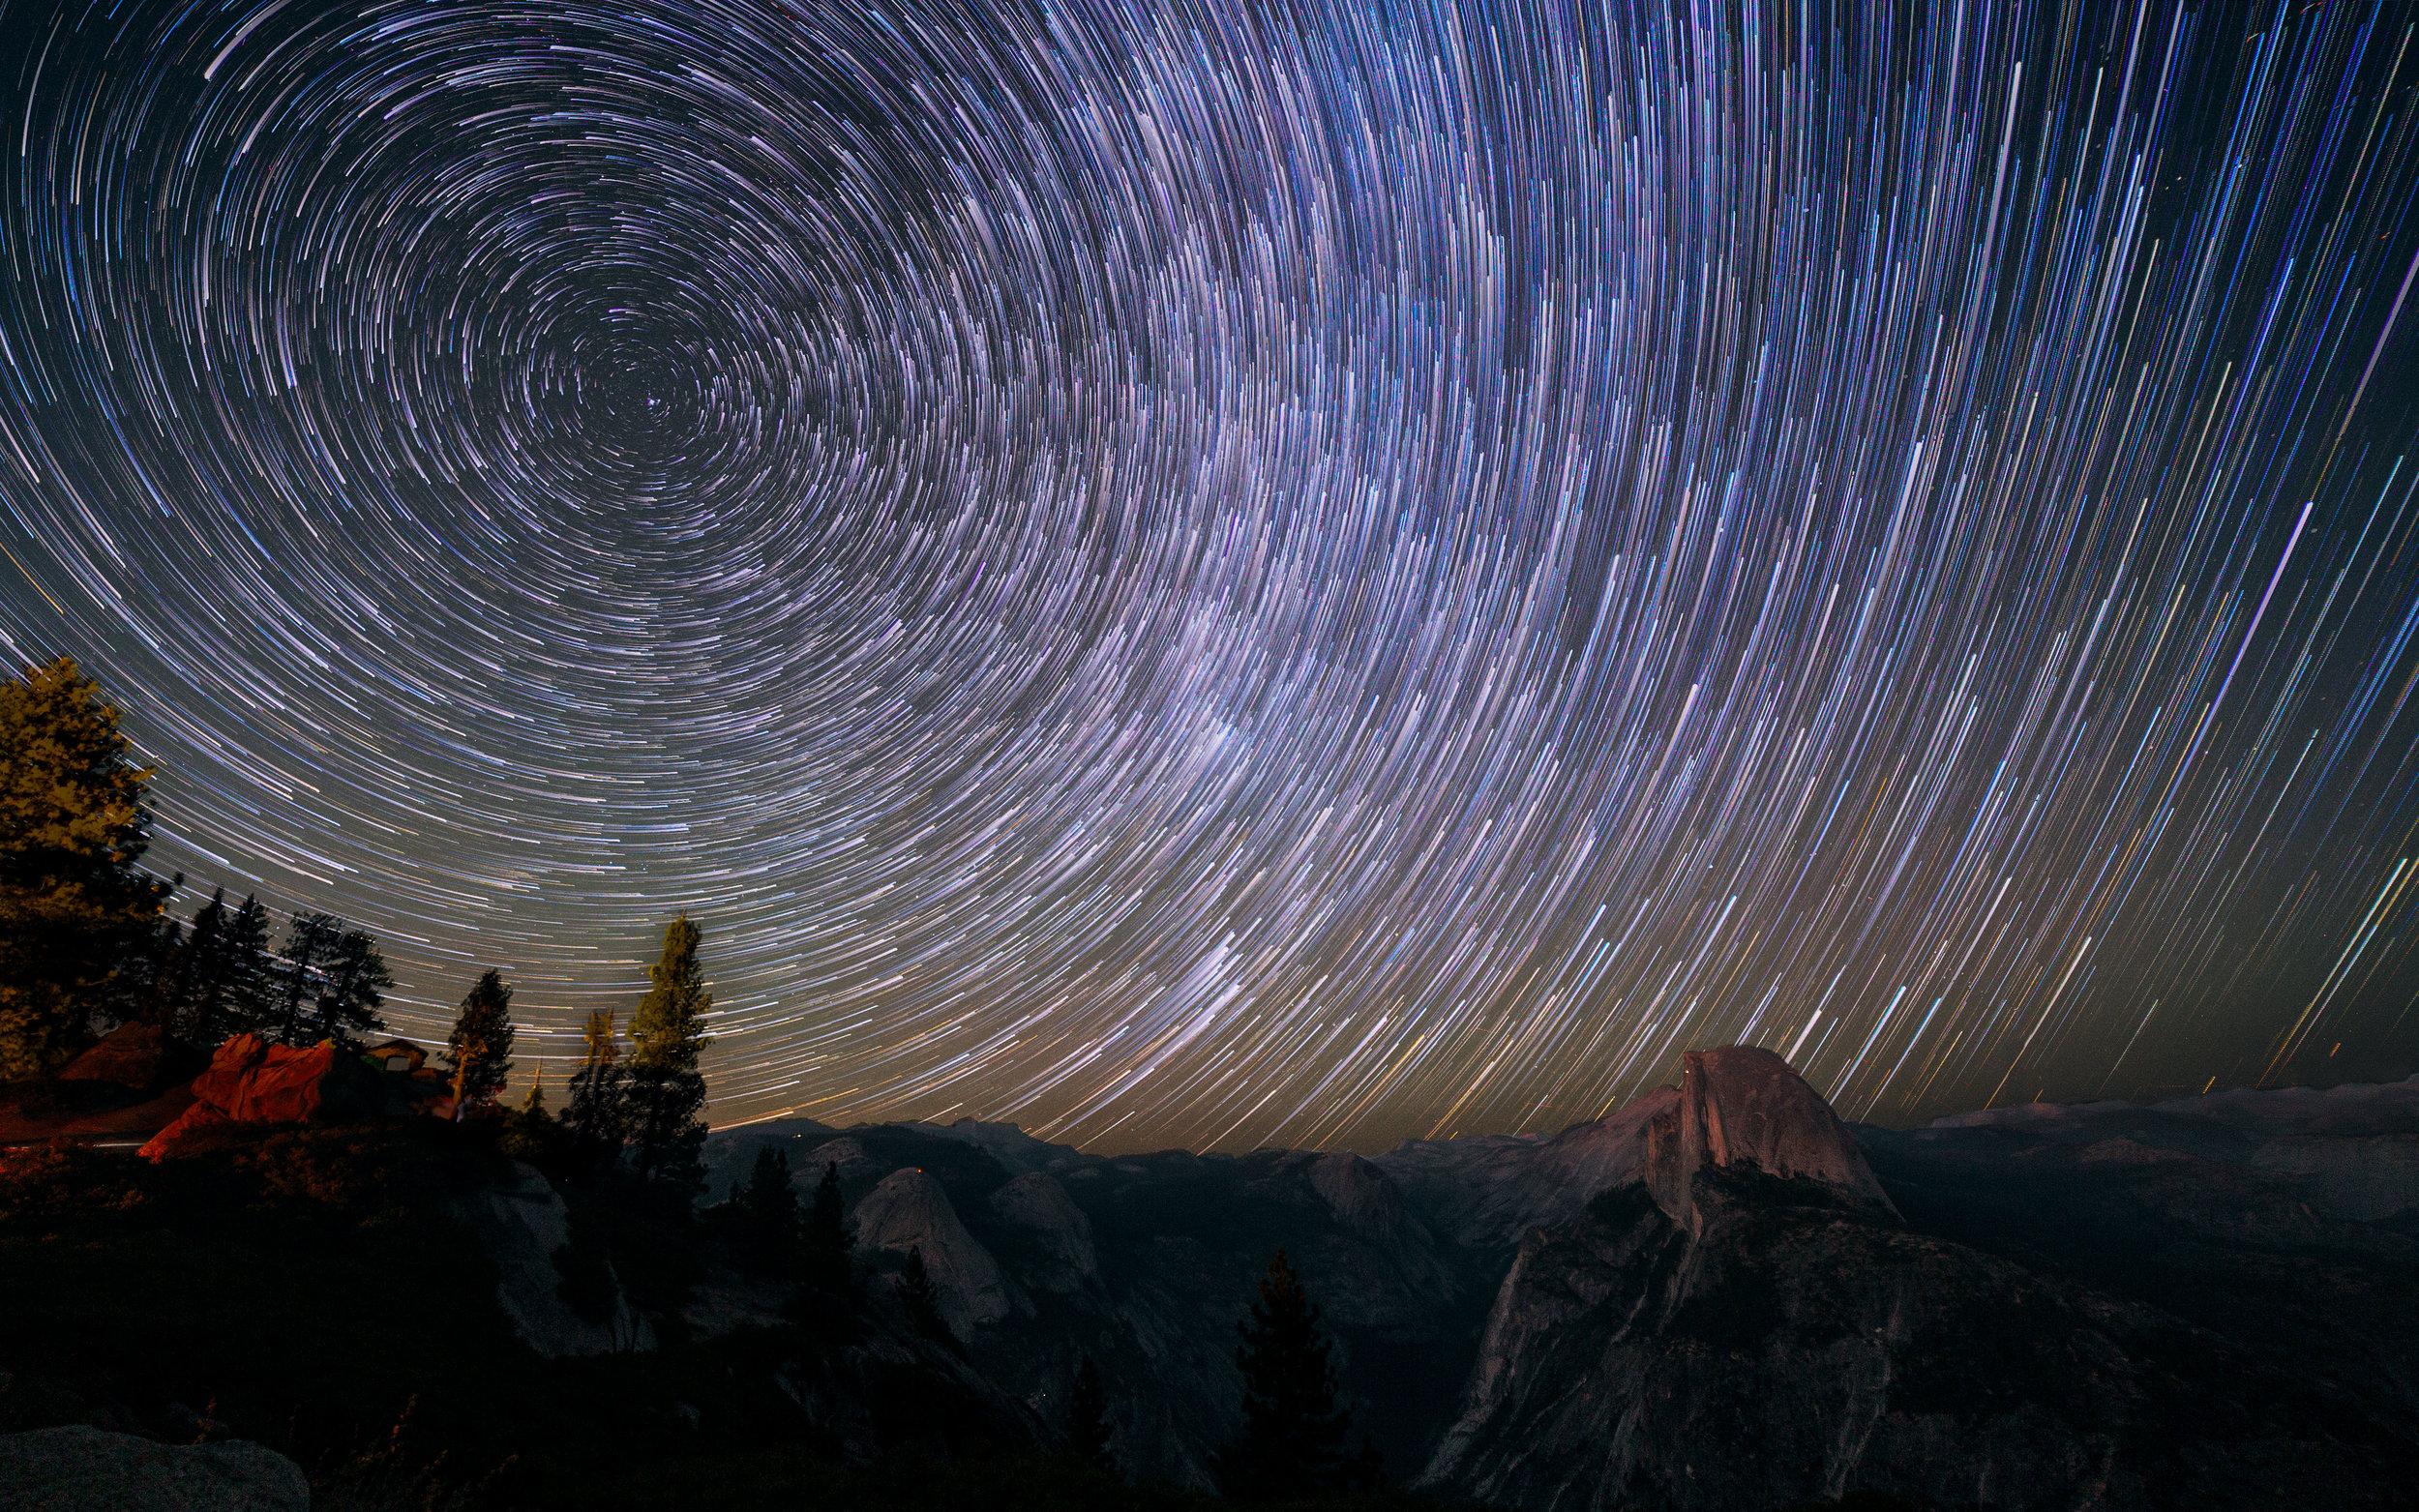 Yosemite Vortex